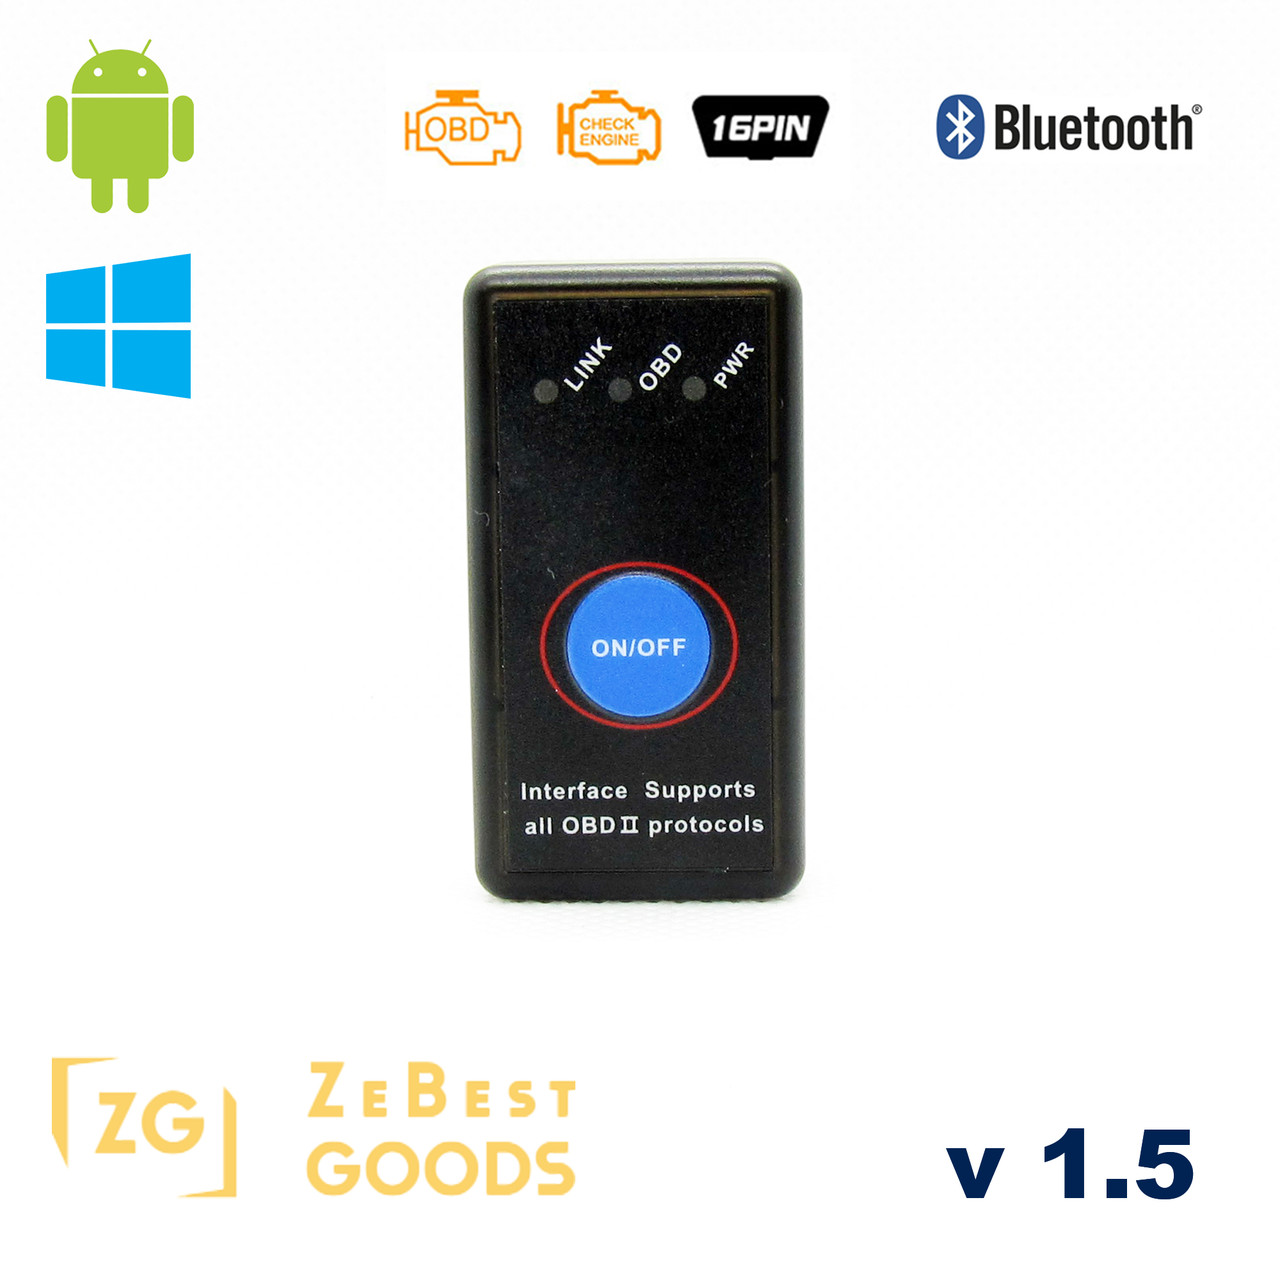 Автосканер ELM327 OBD2 версія 1.5 Bluetooth 2.0 чіп PIC18F25K80 Android/Windows з кнопкою ON/OFF